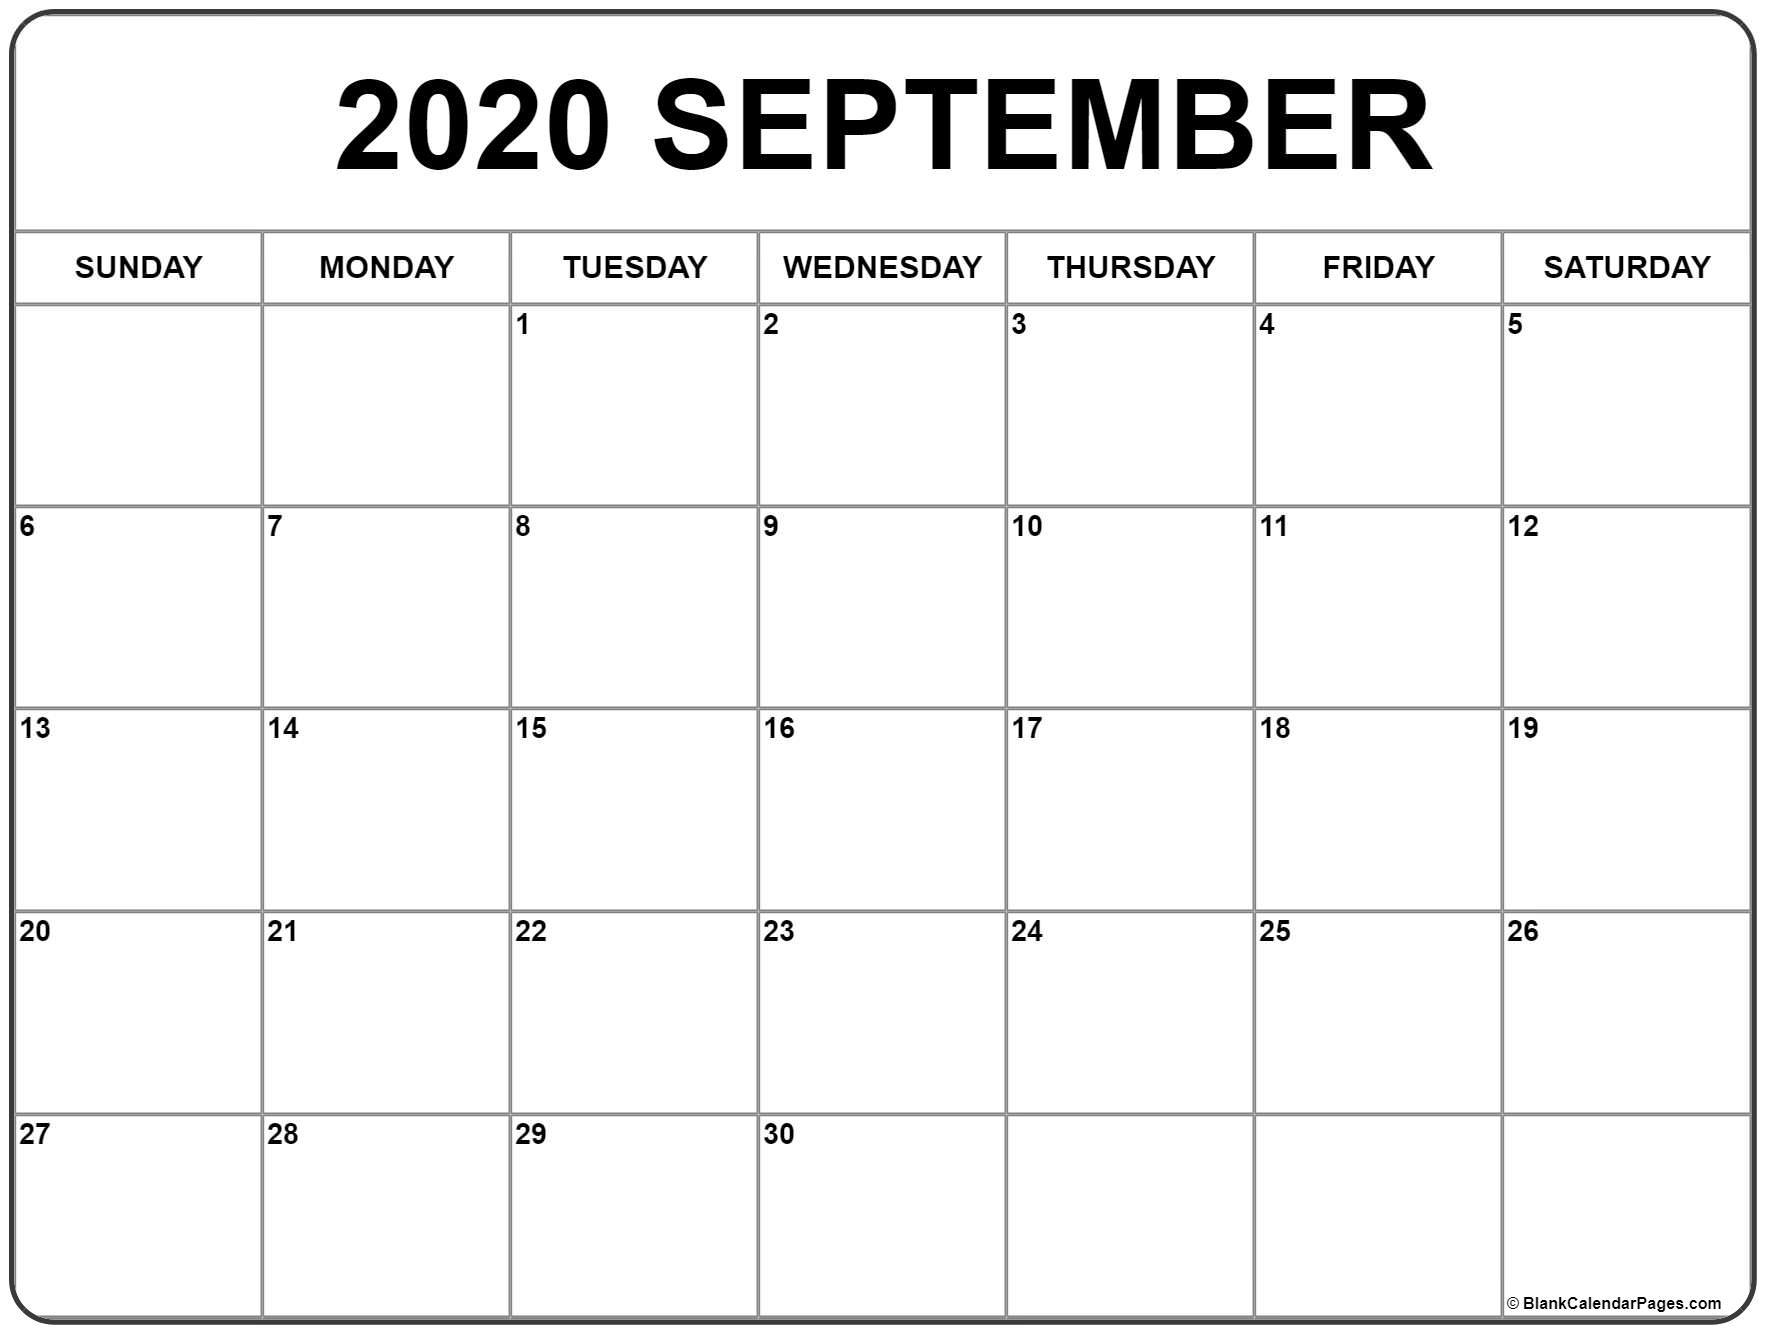 September 2020 Calendar | Free Printable Monthly Calendars inside Online Free Printable Calendar 2020